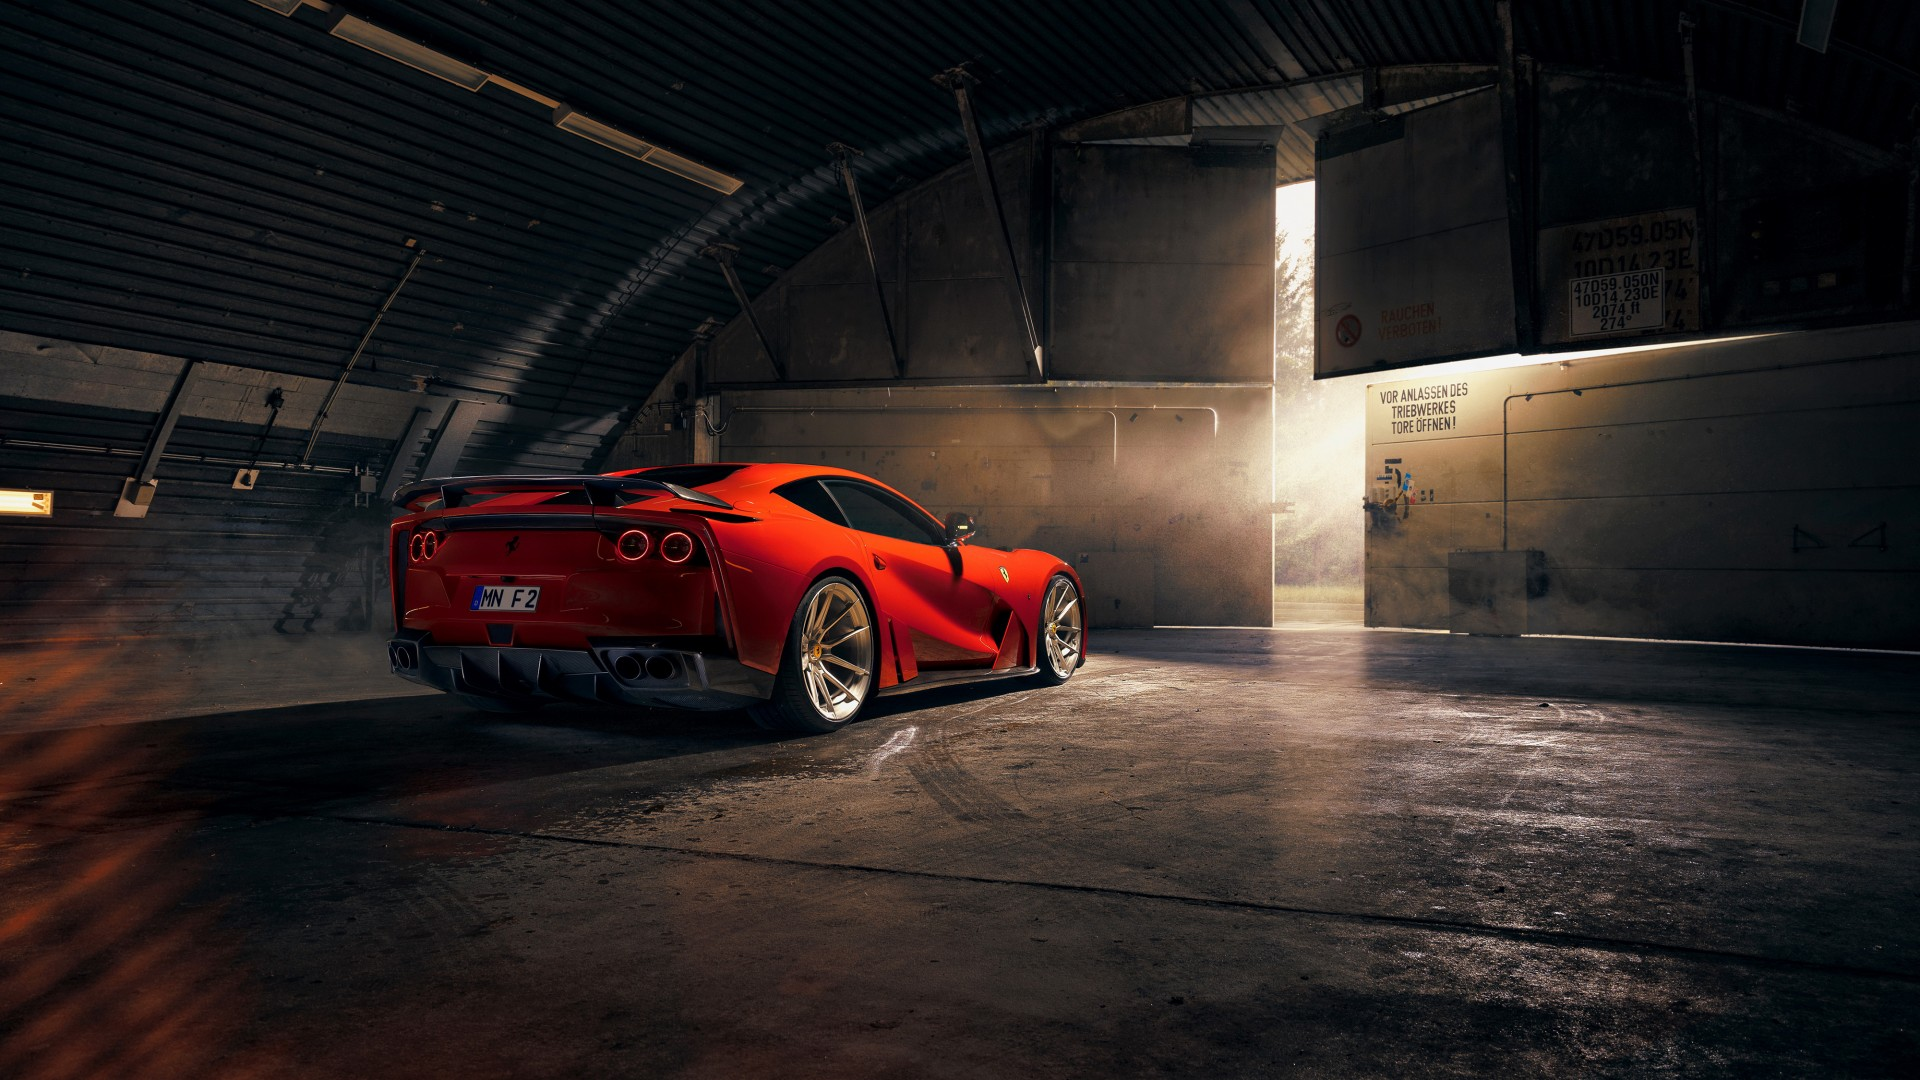 Bmw Of Lincoln >> Novitec Ferrari 812 Superfast N-Largo 2019 4K 2 Wallpaper | HD Car Wallpapers | ID #12633